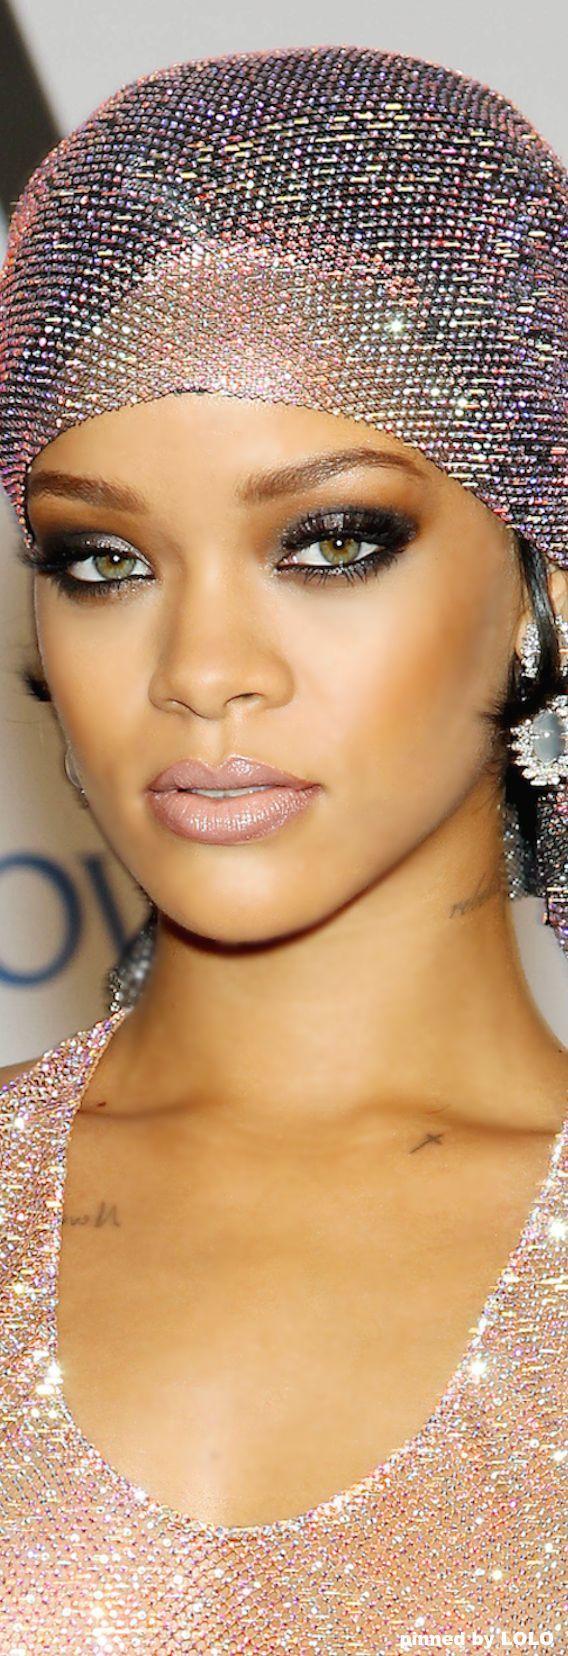 Rihanna sem palavras!!! Diva